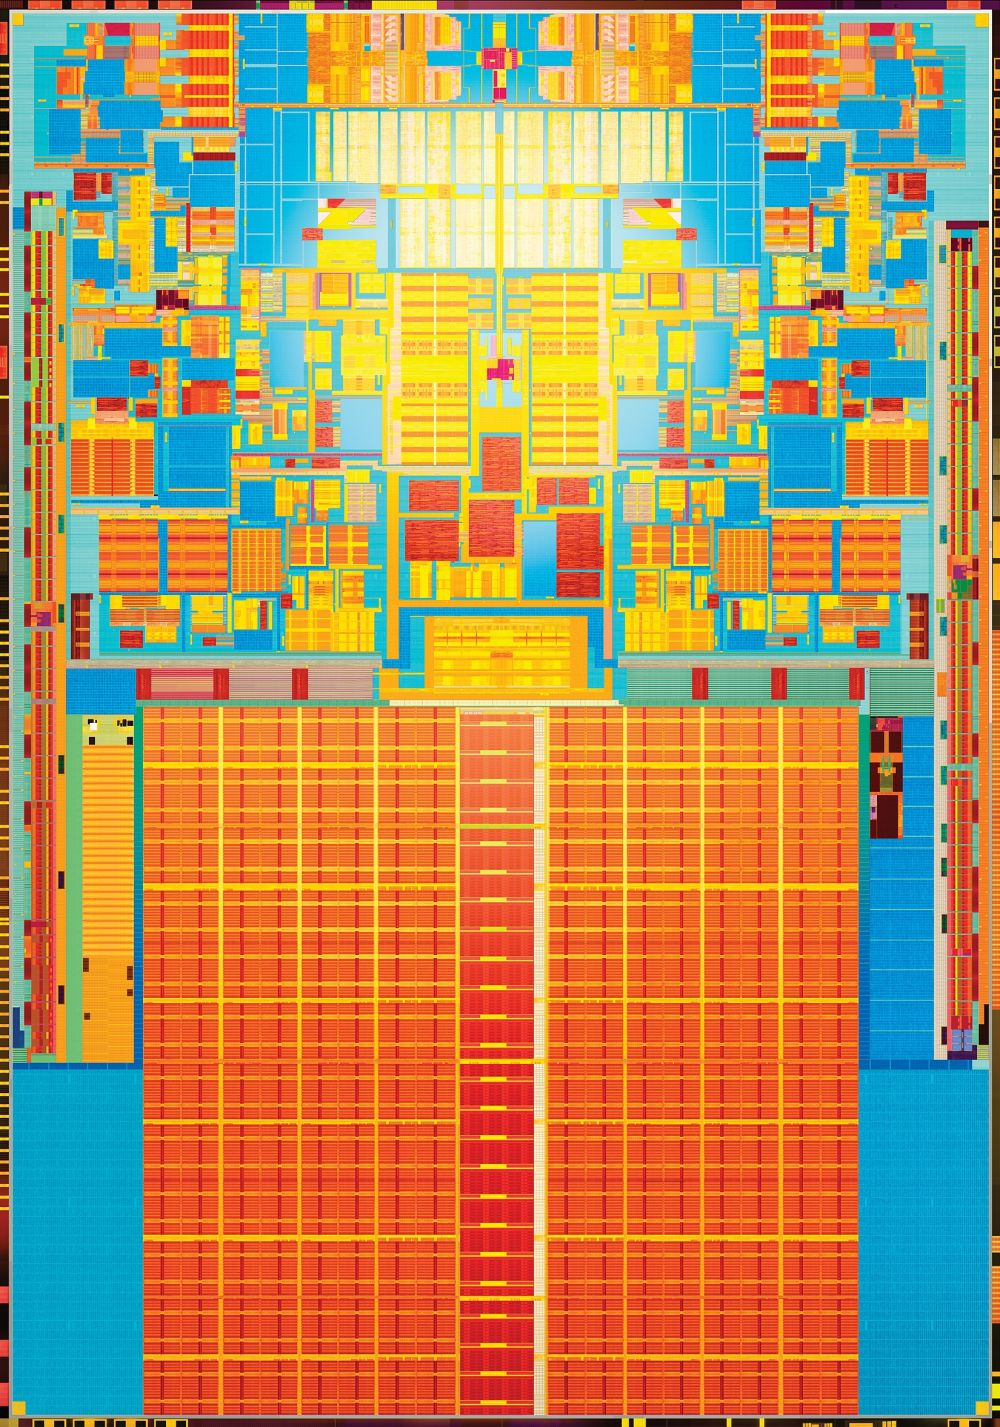 45nm Dual-Core